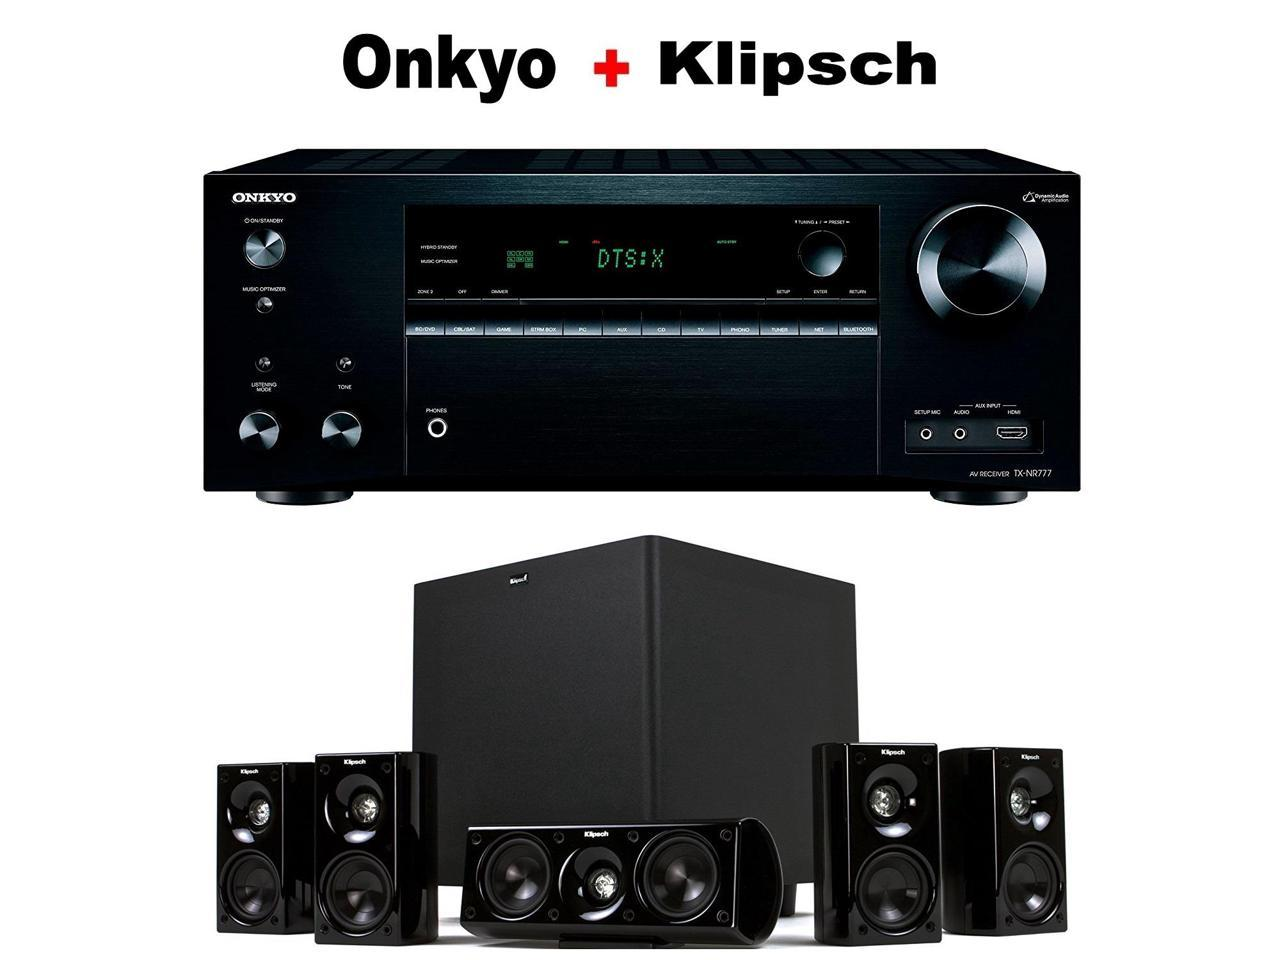 Onkyo TX-NR777 receiver + Klipsch HD Theater 600 home theater speaker system bundle